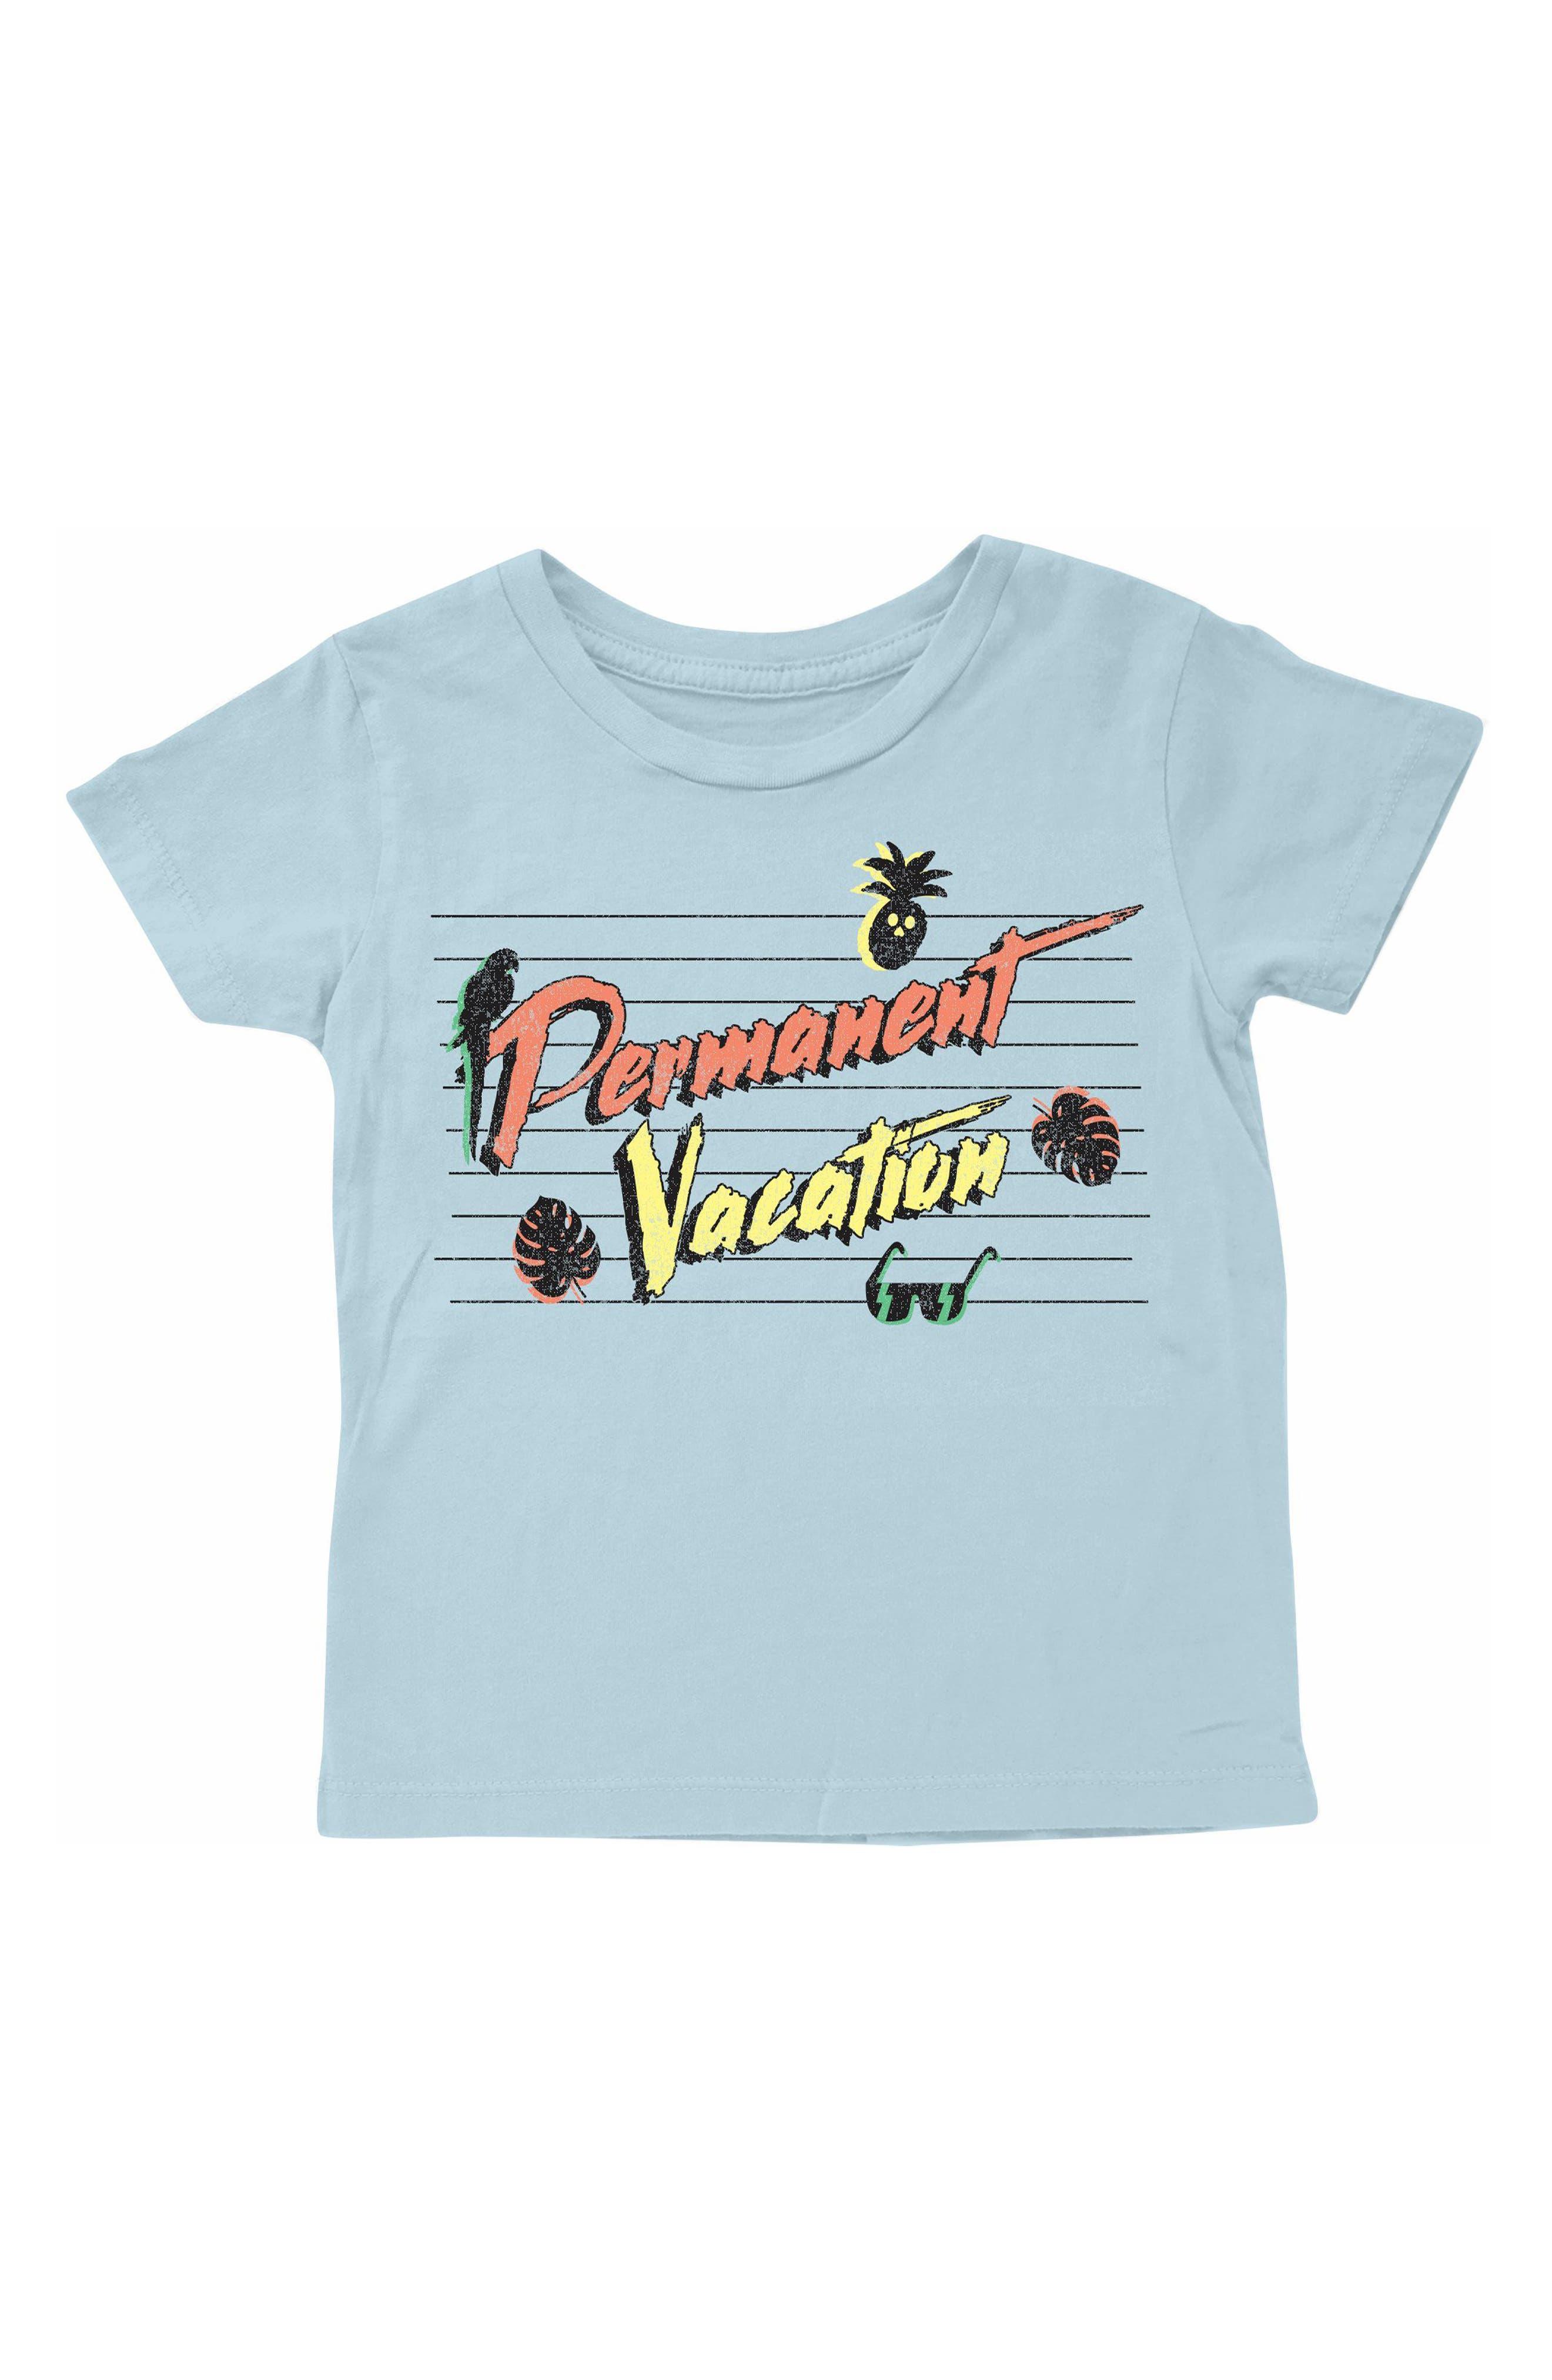 Permanent Vacation T-Shirt,                             Main thumbnail 1, color,                             Light Blue